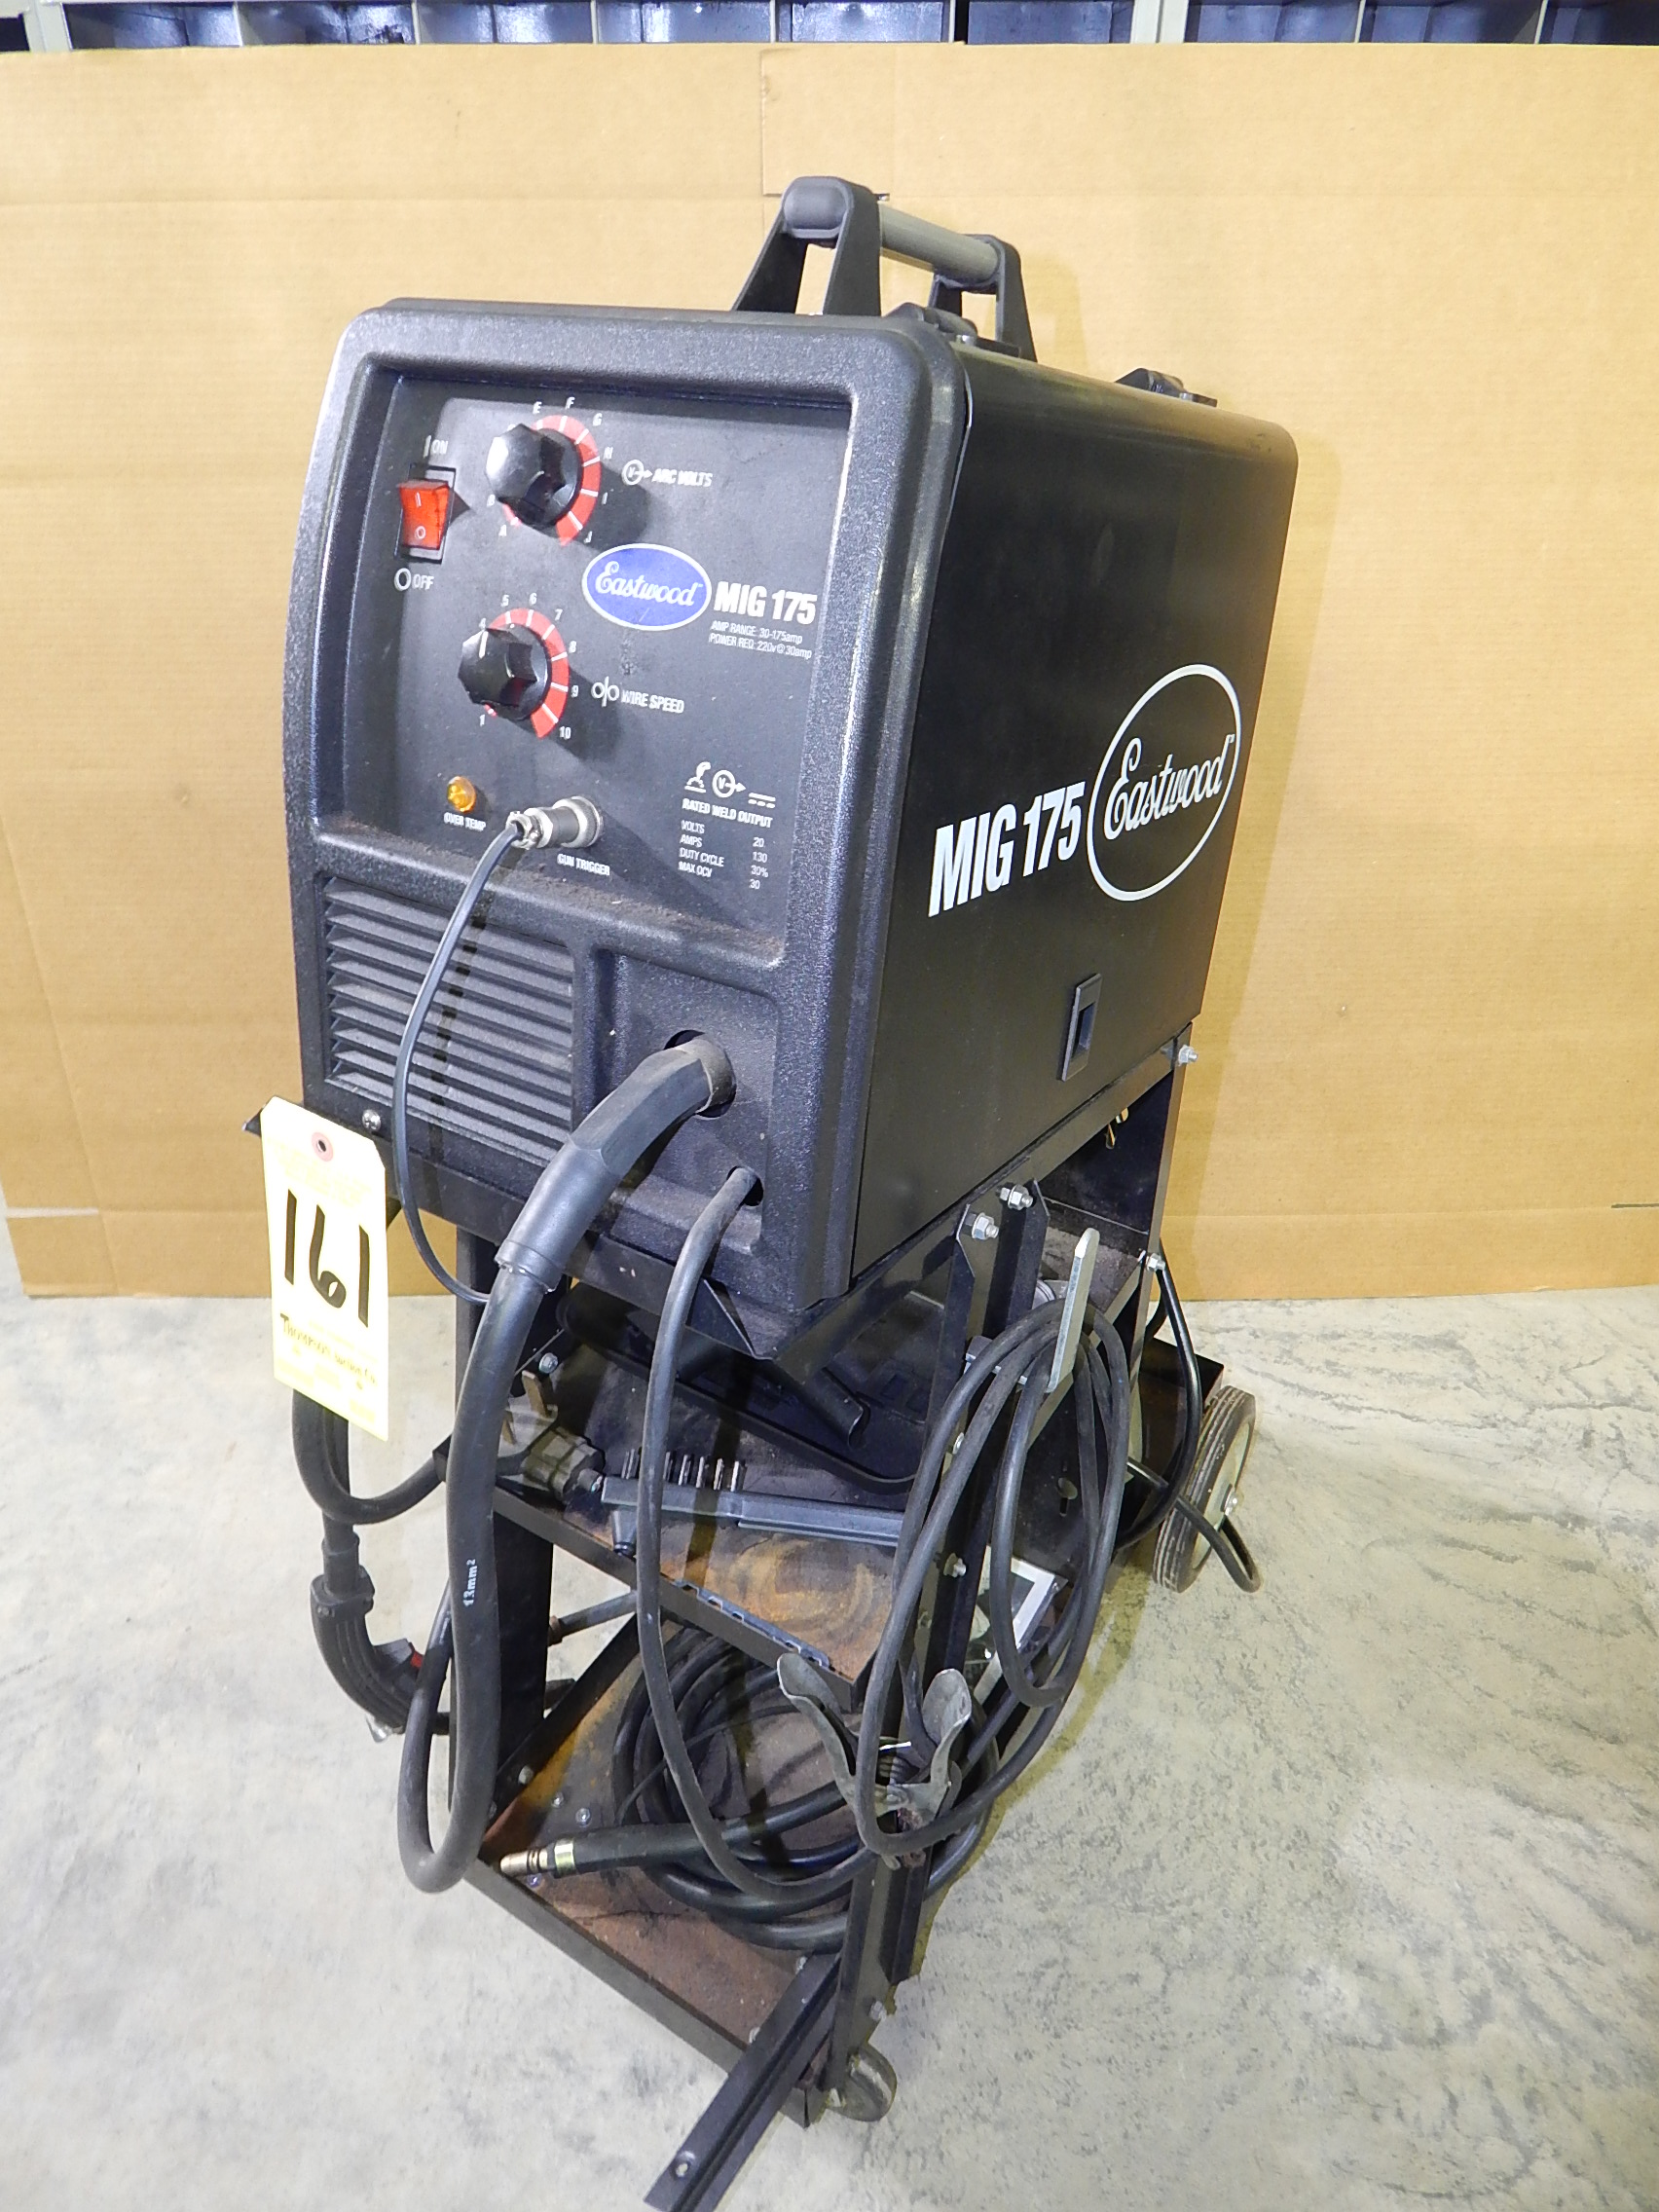 Eastwood MIG 175 Mig Welder, SN 122471406022, with Aluminum Wire ...